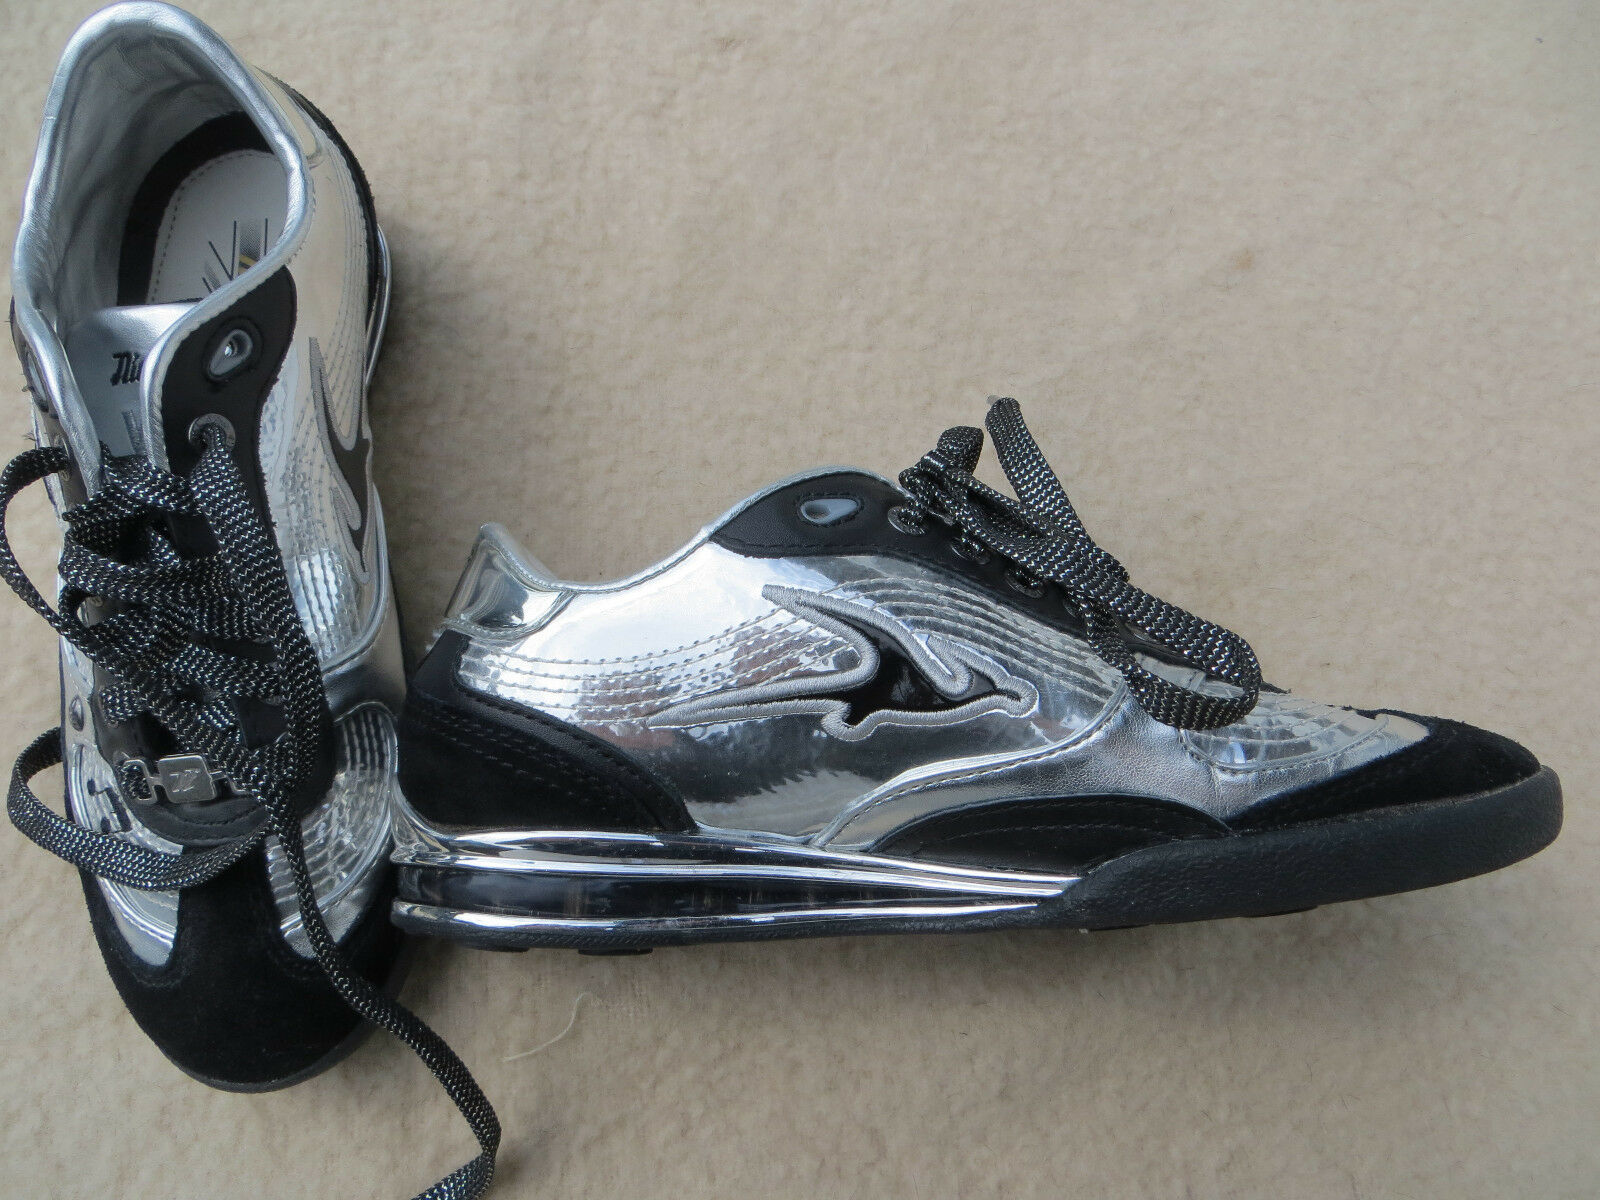 NE Nice England Sneaker Metallic Silber Schwarz Gr. 37 UK 4.0 Neu Ungetragen